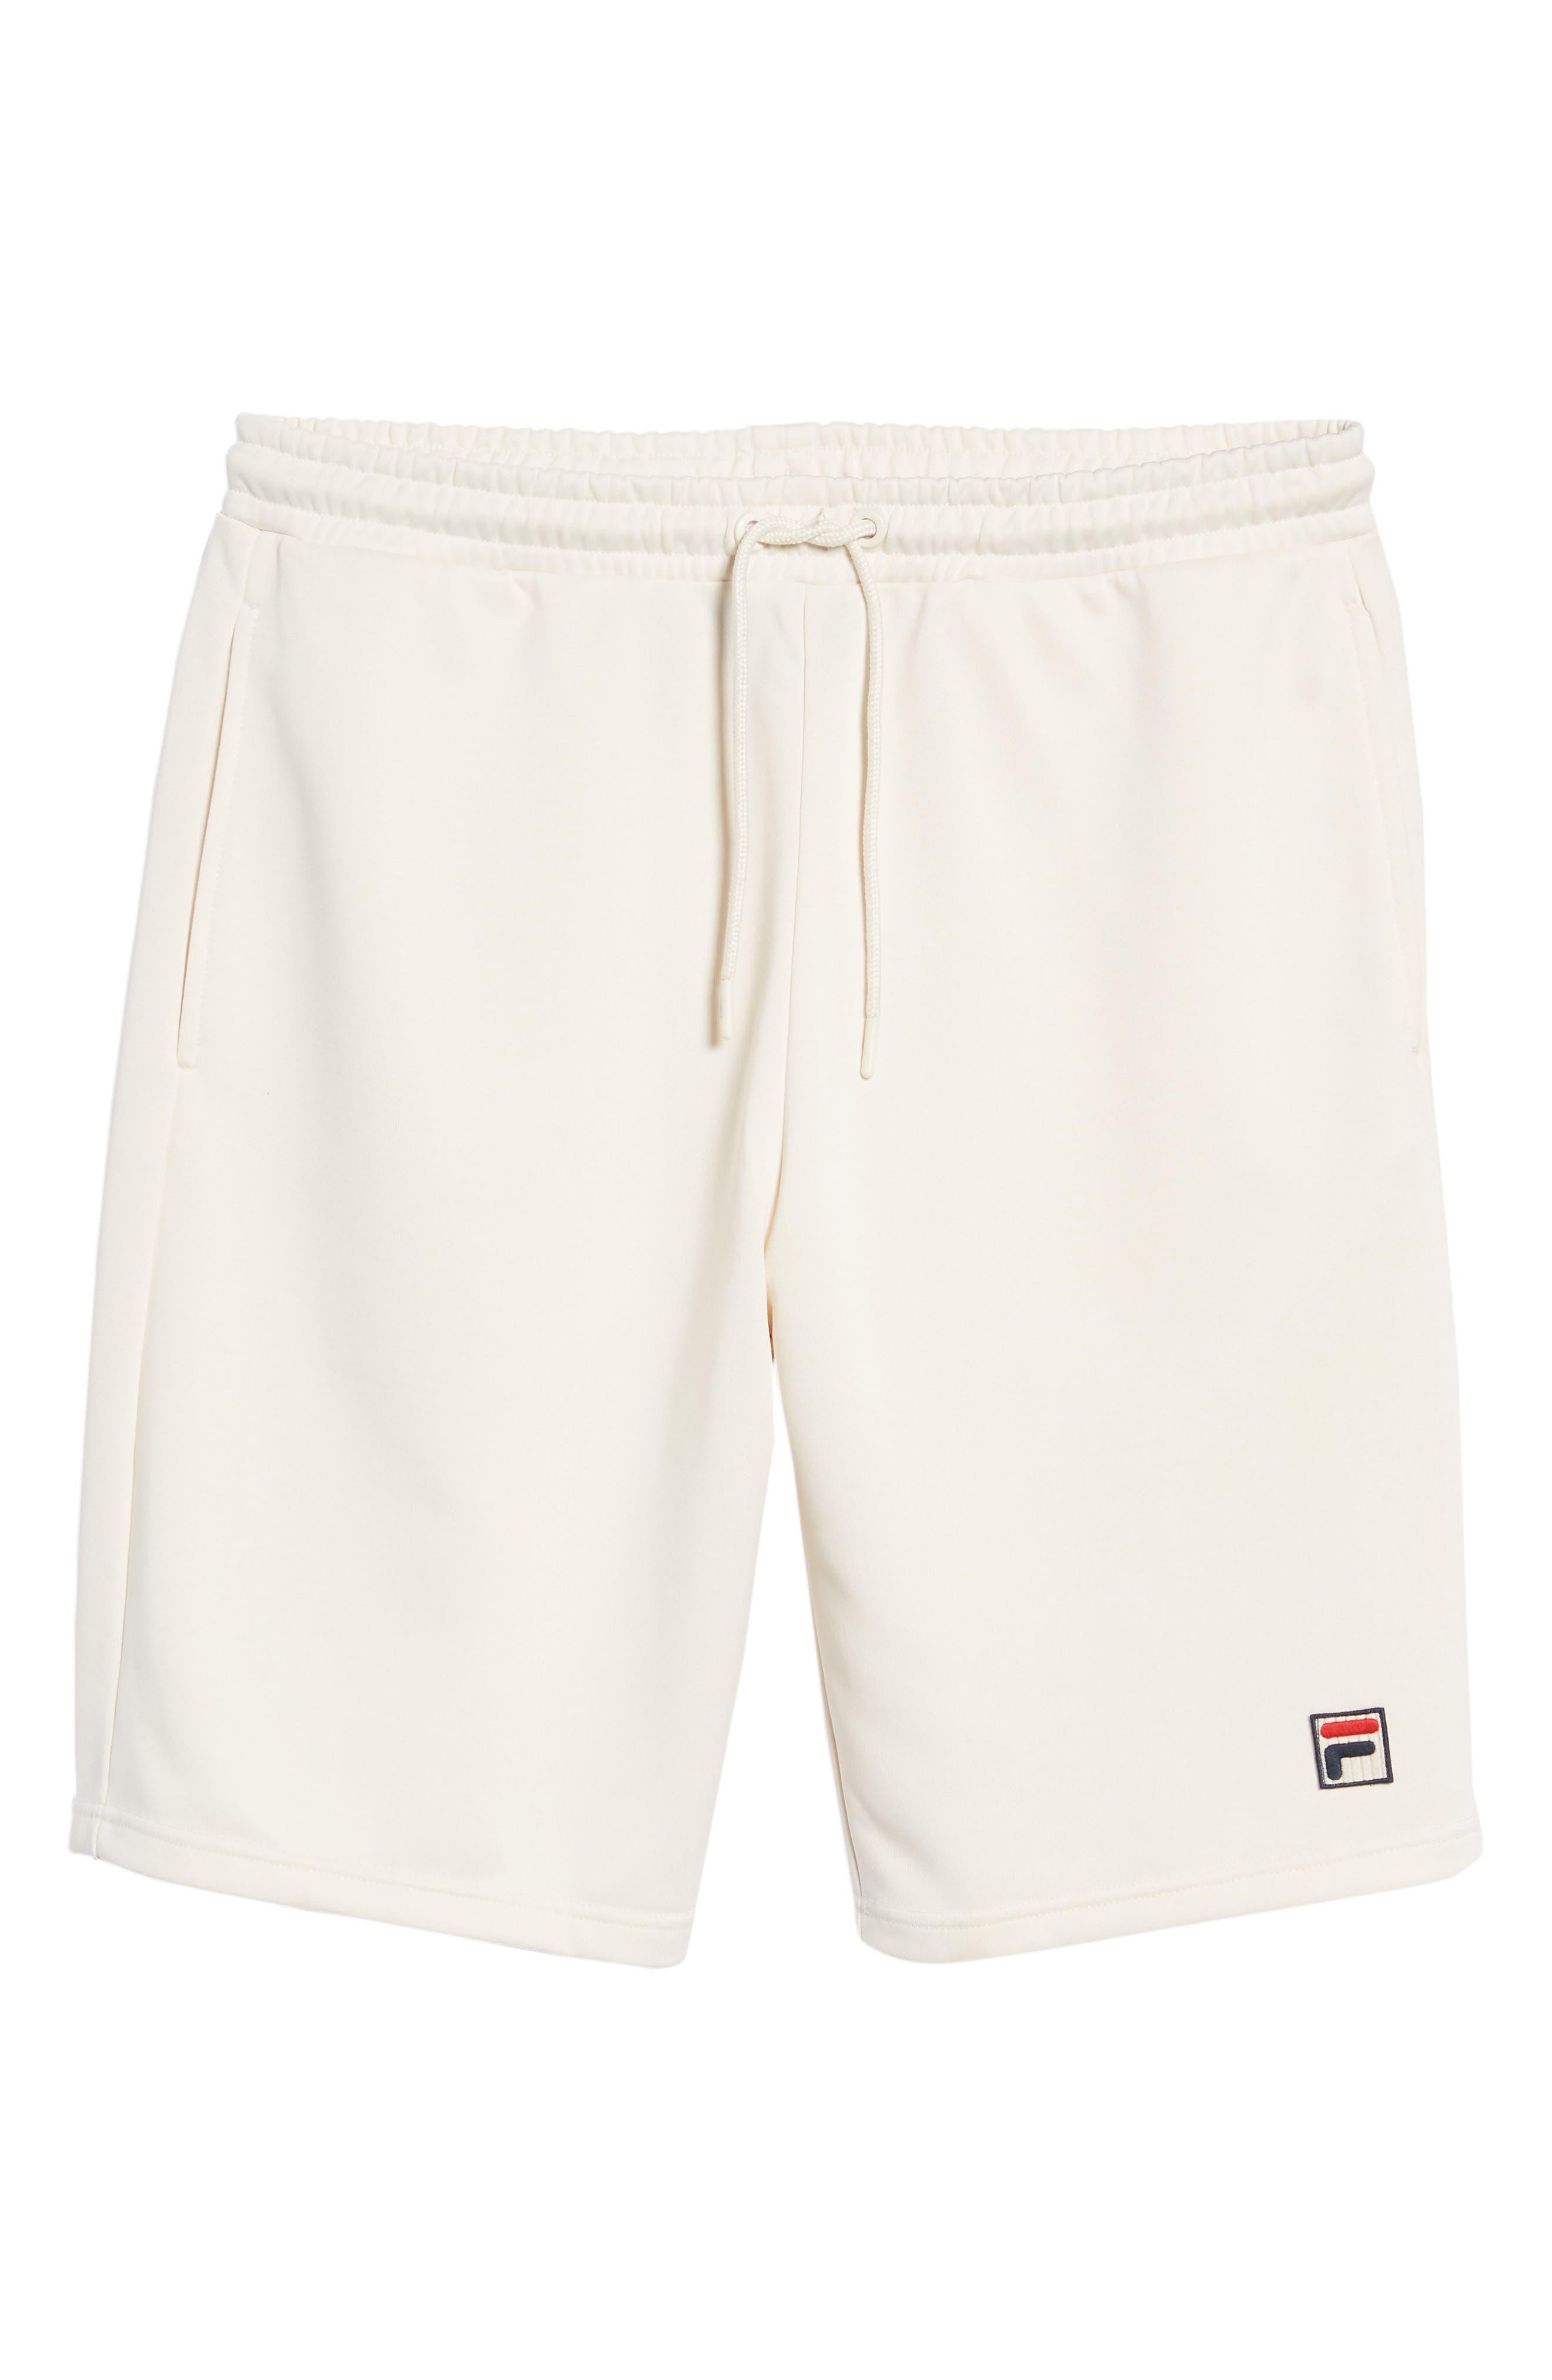 Dominico Shorts,                             Alternate thumbnail 6, color,                             130